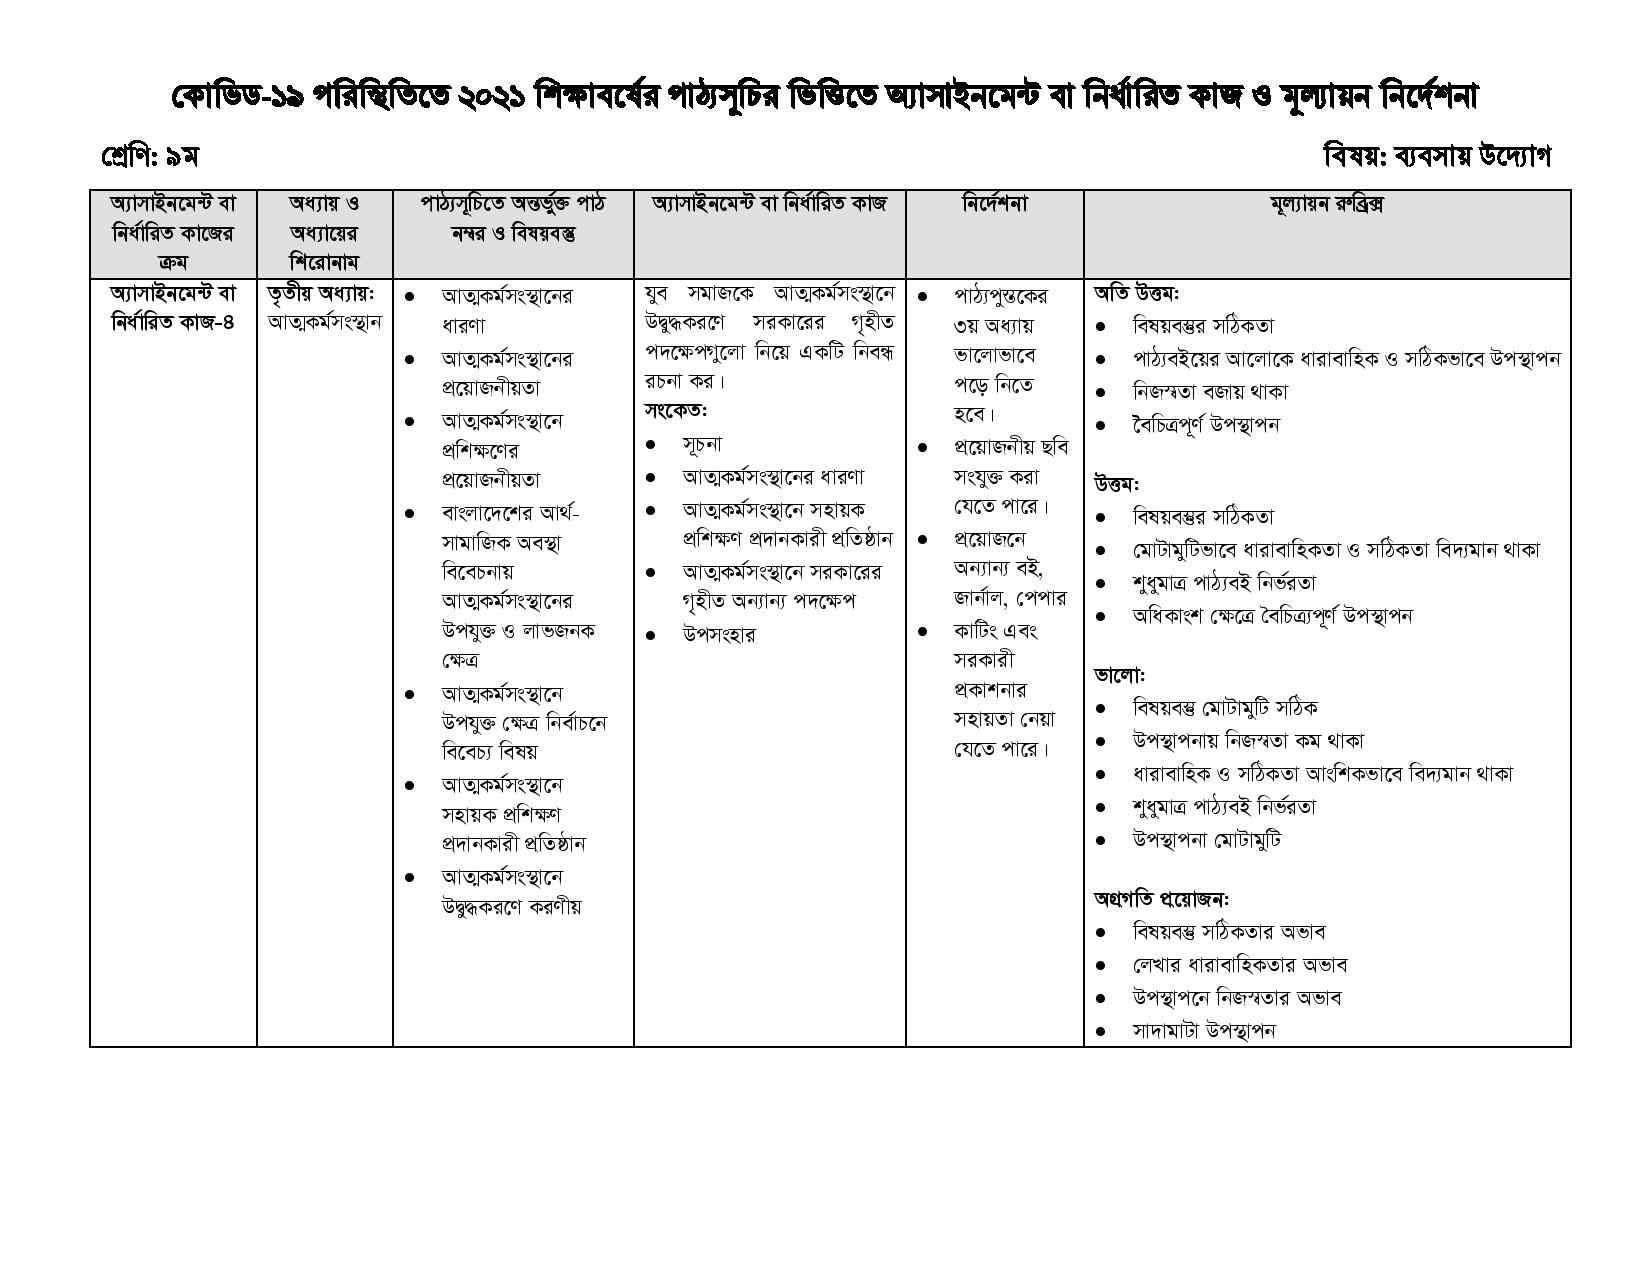 Class 9 17th Week Business Entrepreneurship Subject Assignment 2021